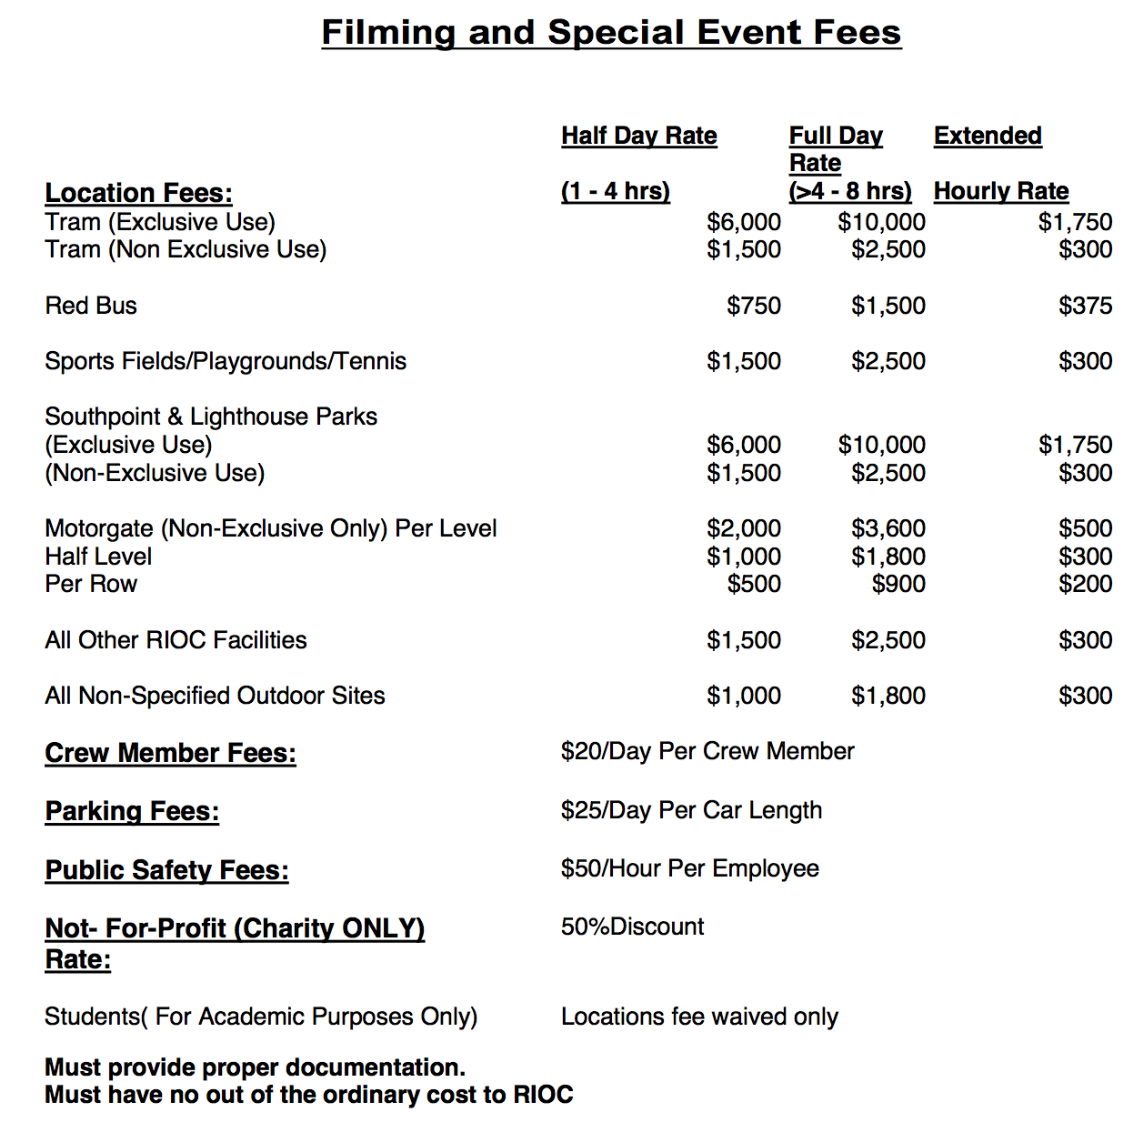 Plan Write Expert Business Planner - US$ 239.95 + S&H